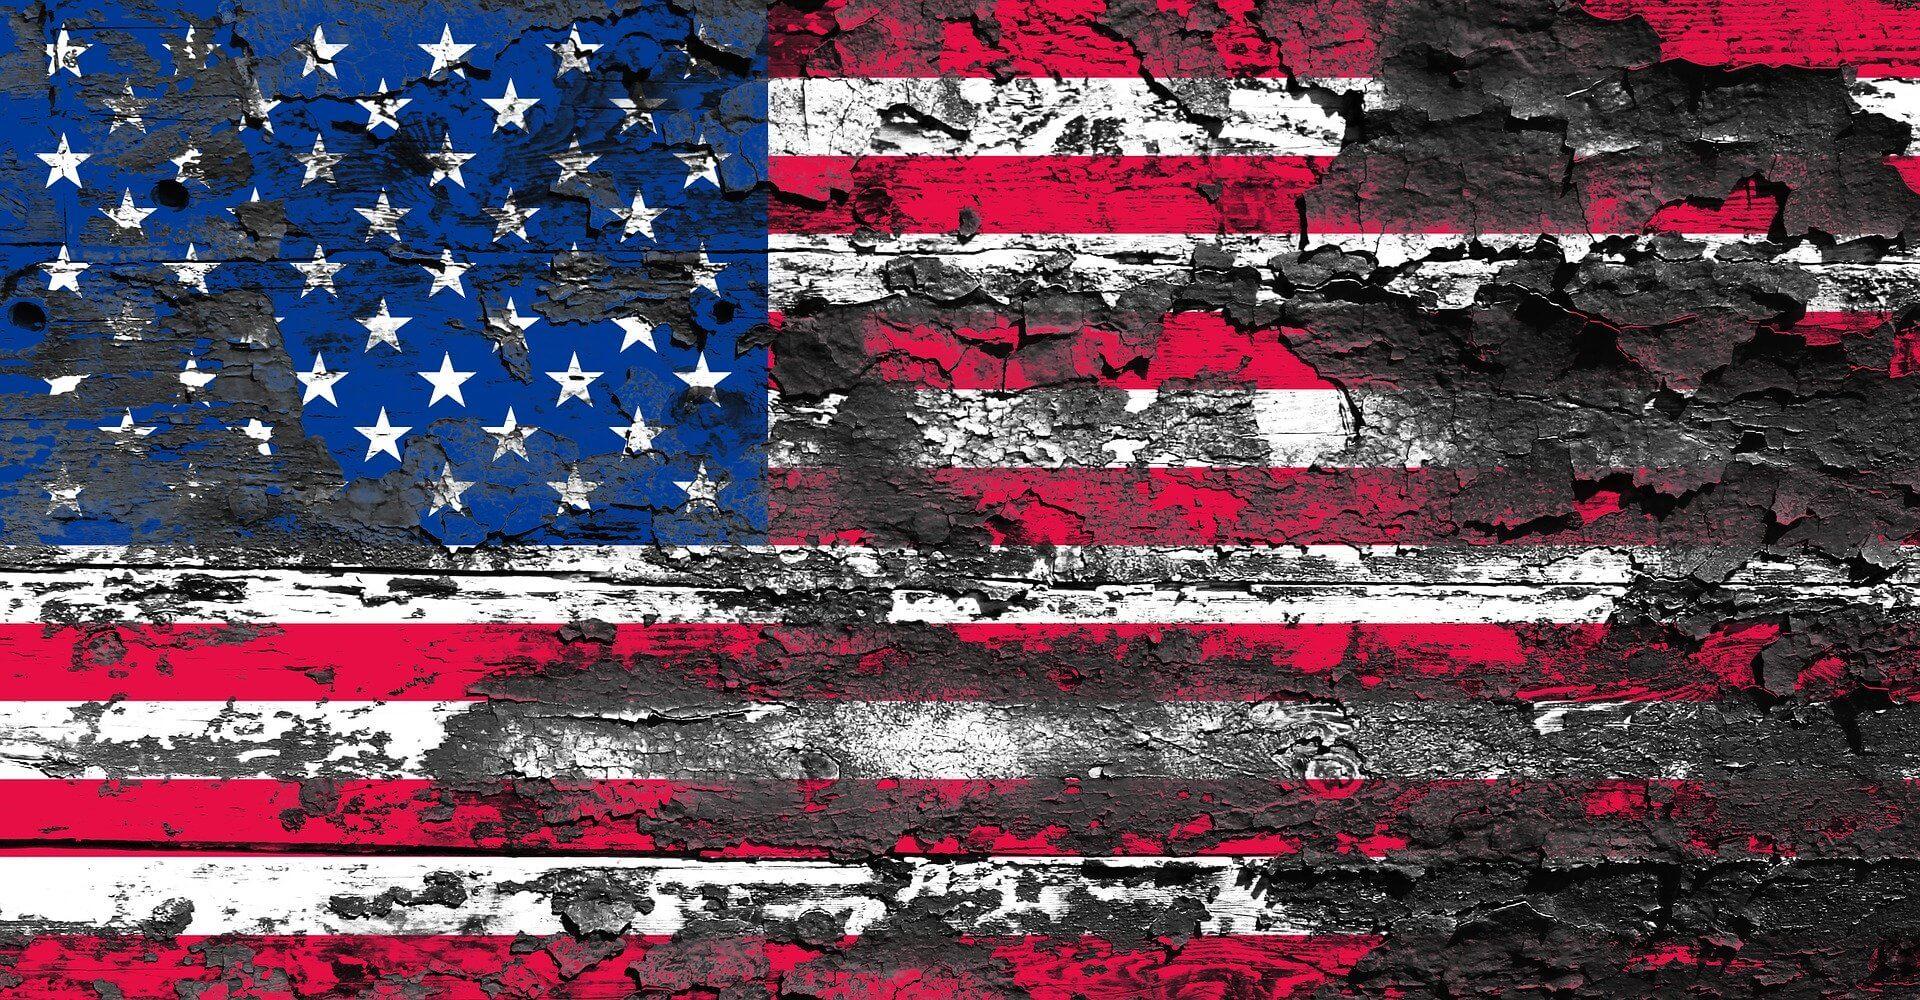 US economy - COVID-19 ensured unemployment